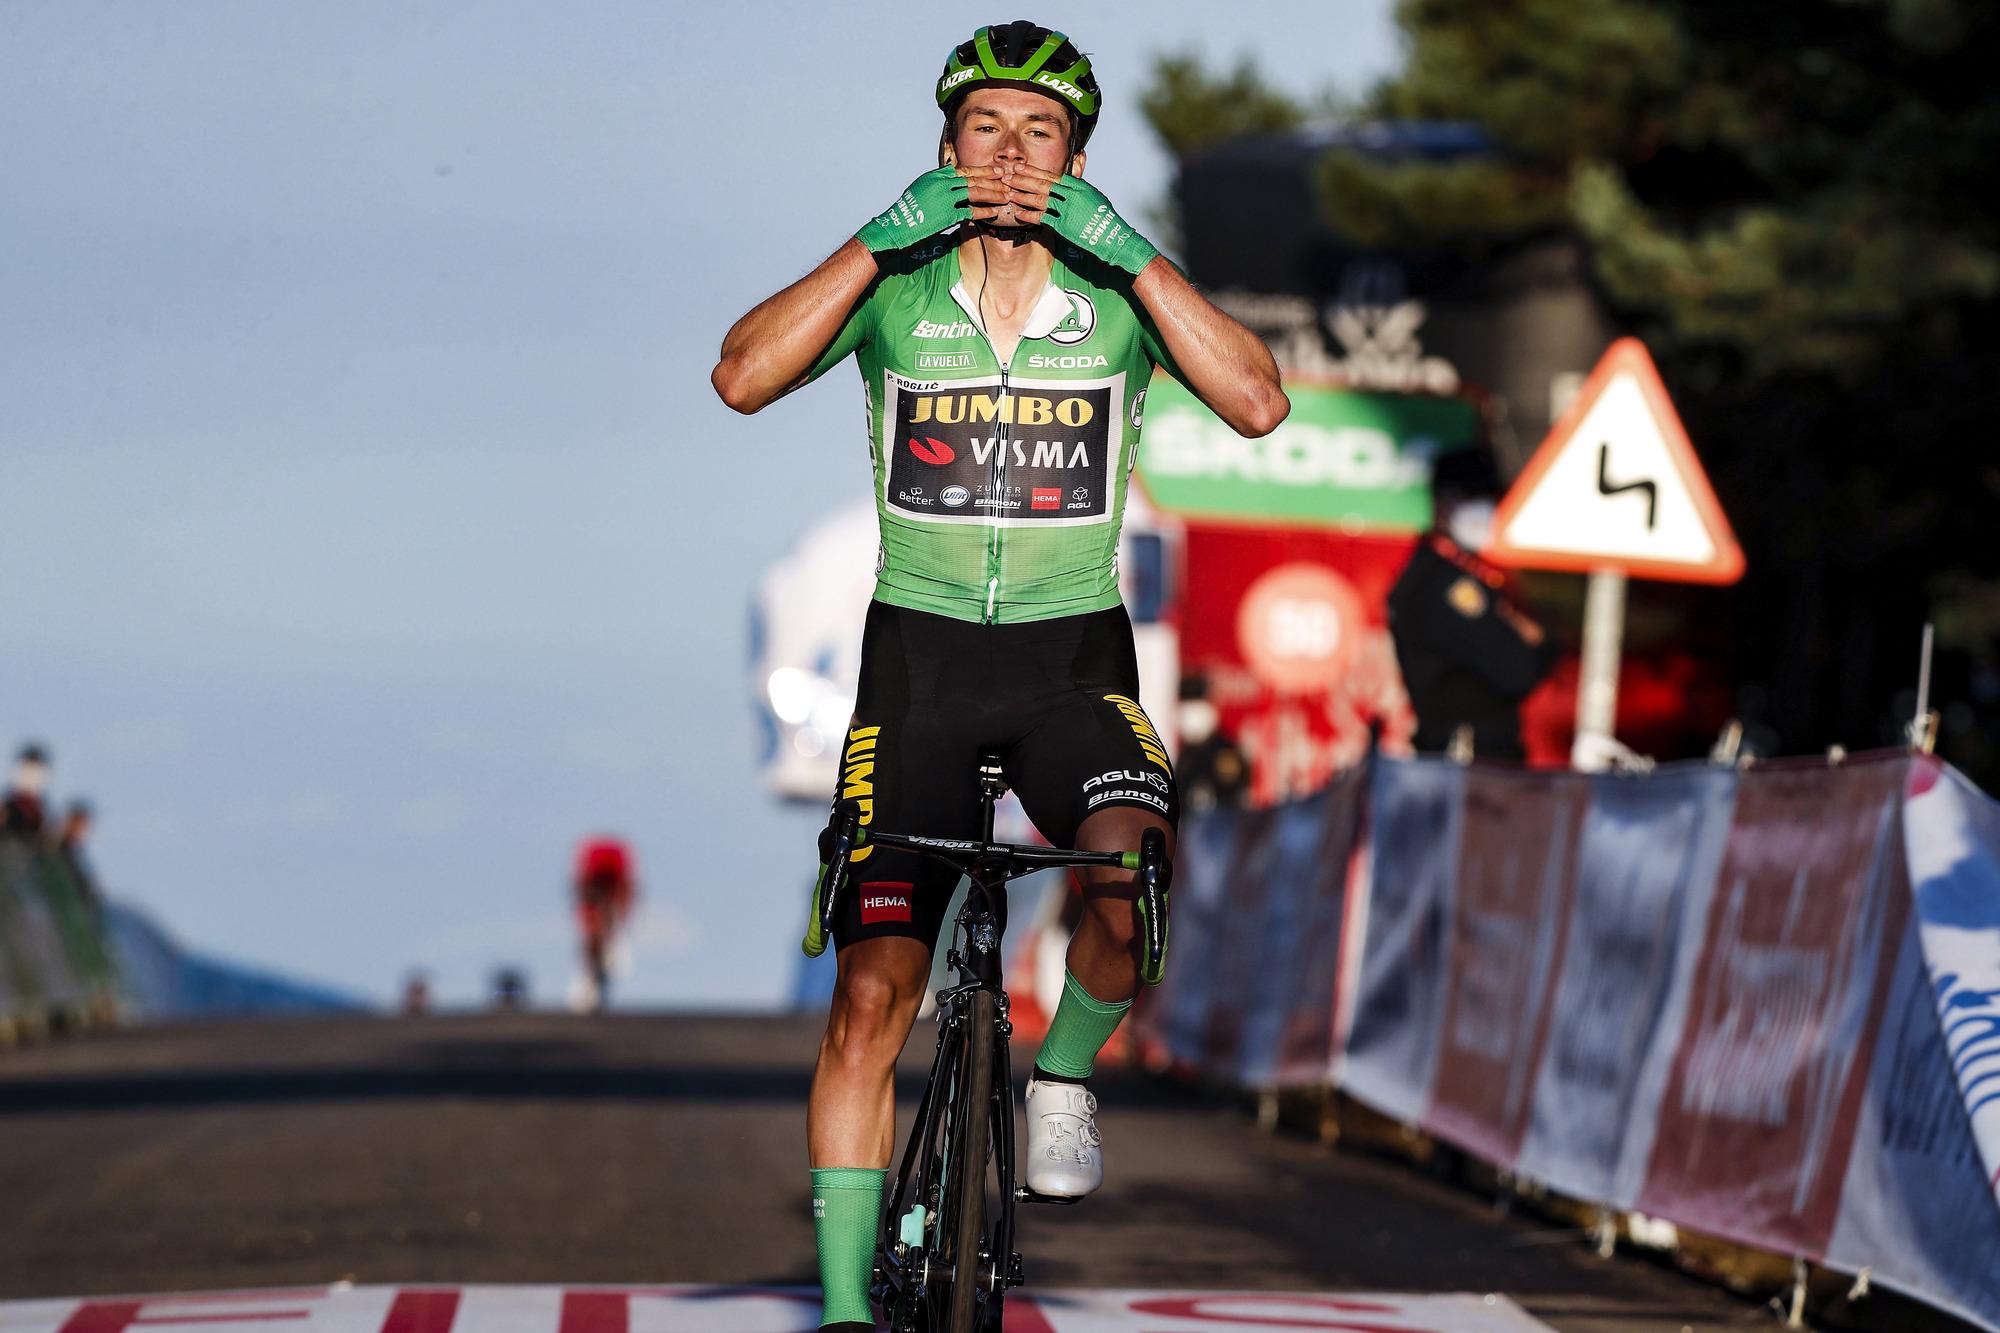 Vuelta Espana 2020 - 75th Edition - 8th stage Logrono - Alto de Moncalvillo 164 km - 28/10/2020 - Primoz Roglic (SLO - Team Jumbo - Visma) - photo Luis Angel Gomez/BettiniPhoto©2020